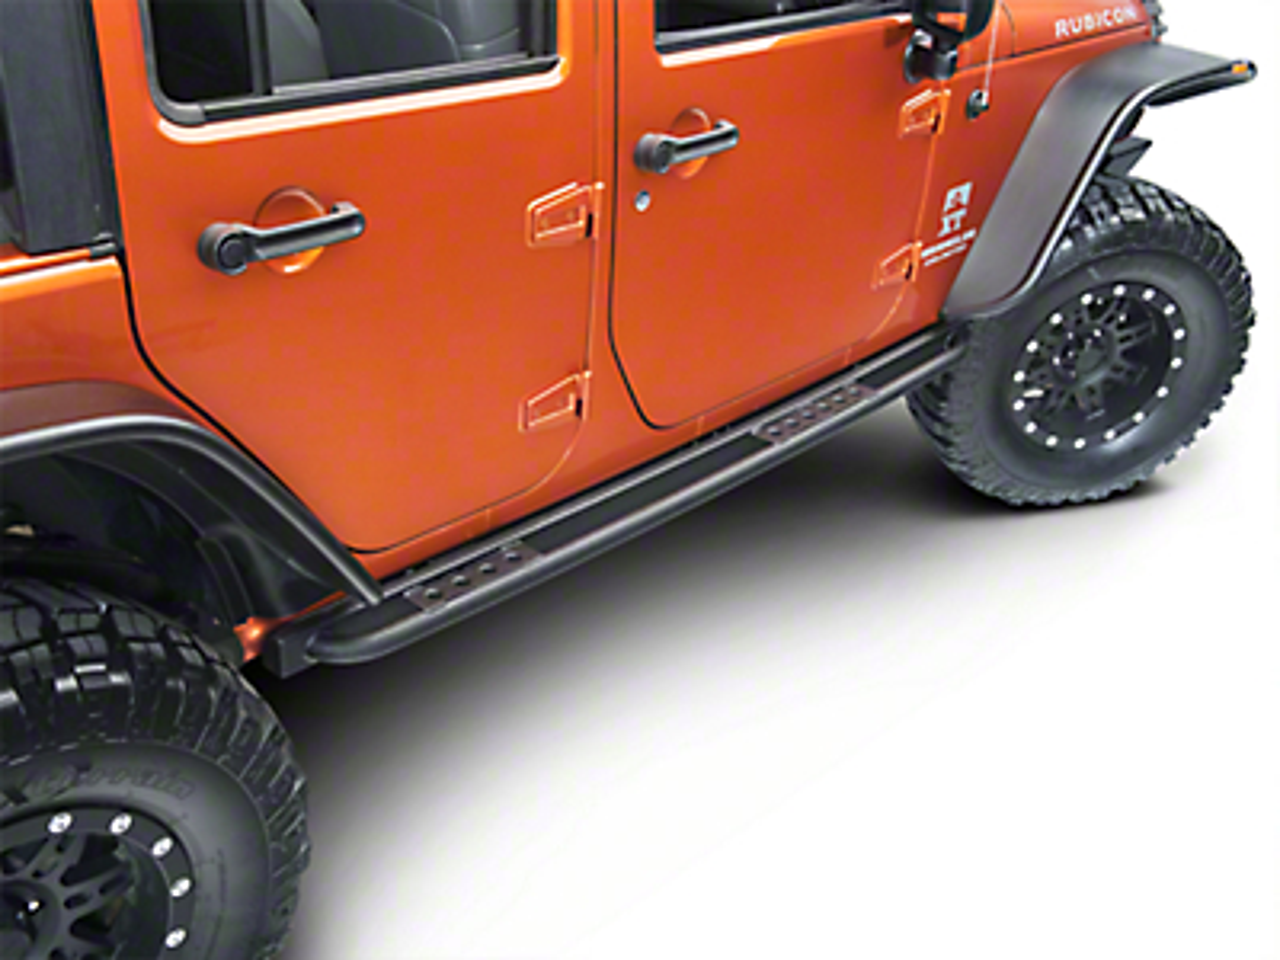 Smittybilt SRC Classic Rock Rails (OEM Style) W/ Step - Black Textured (07-17 Wrangler JK 4 Door)